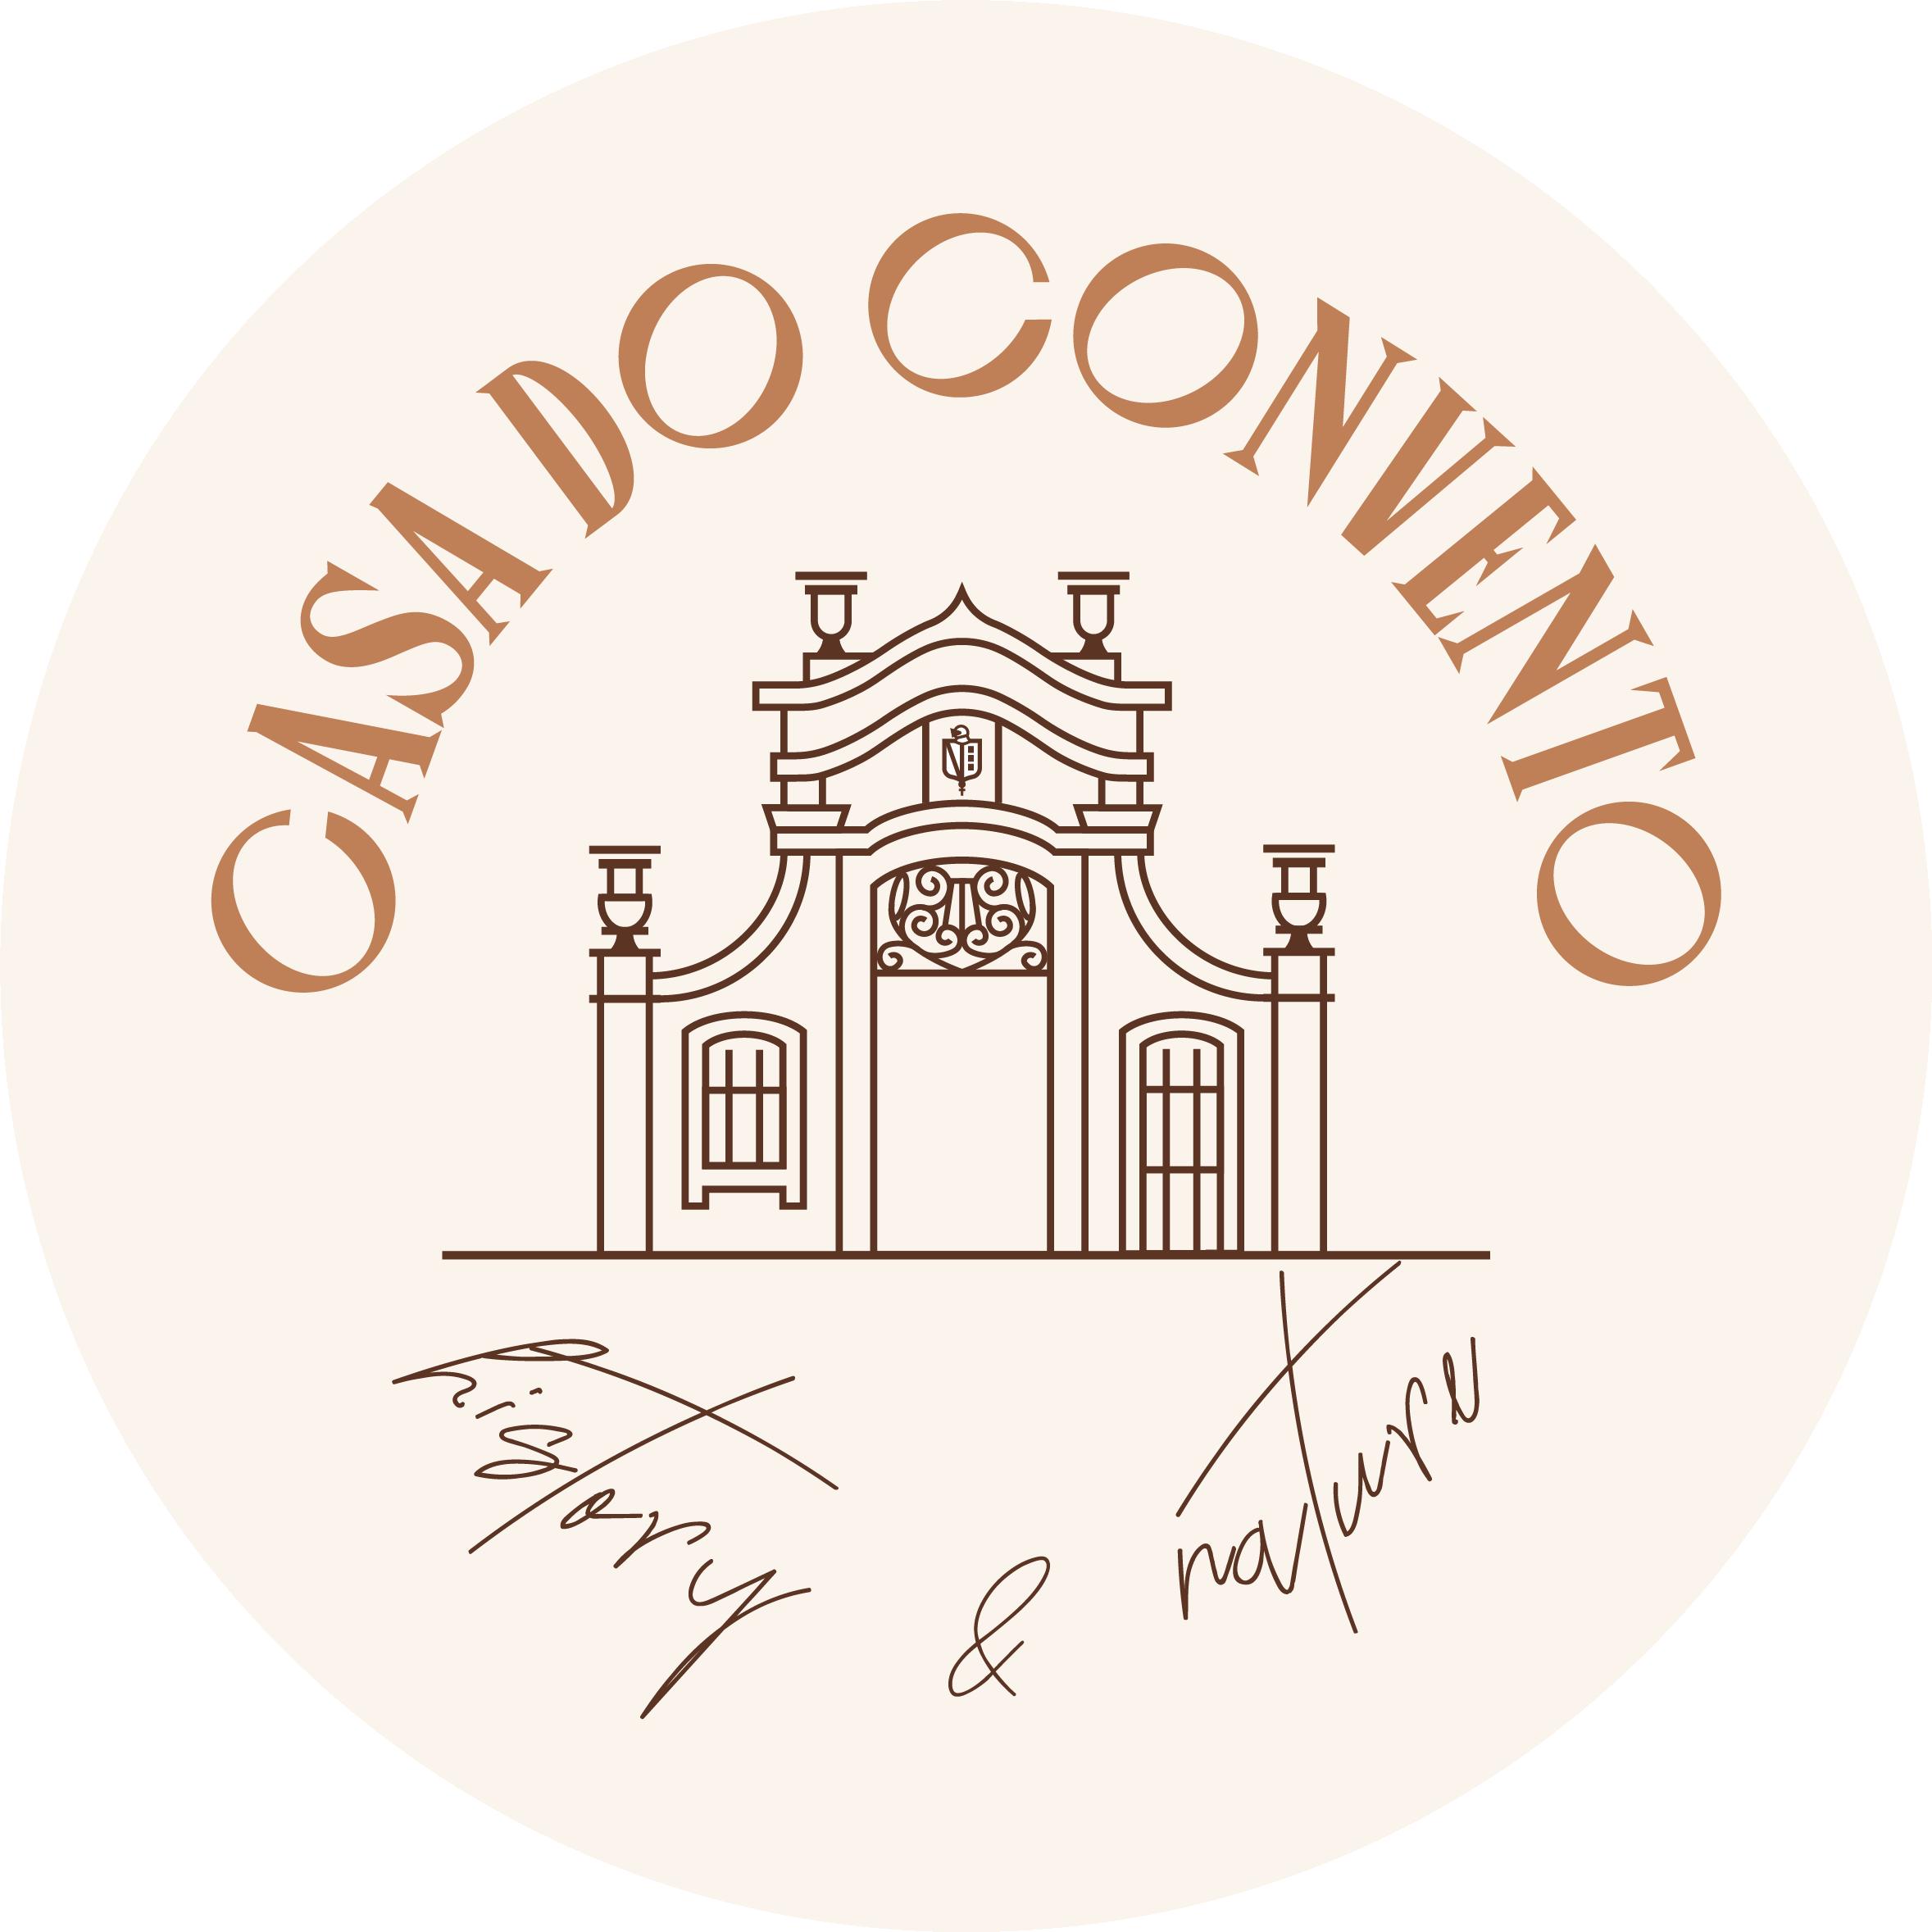 convento-redondo-fundov